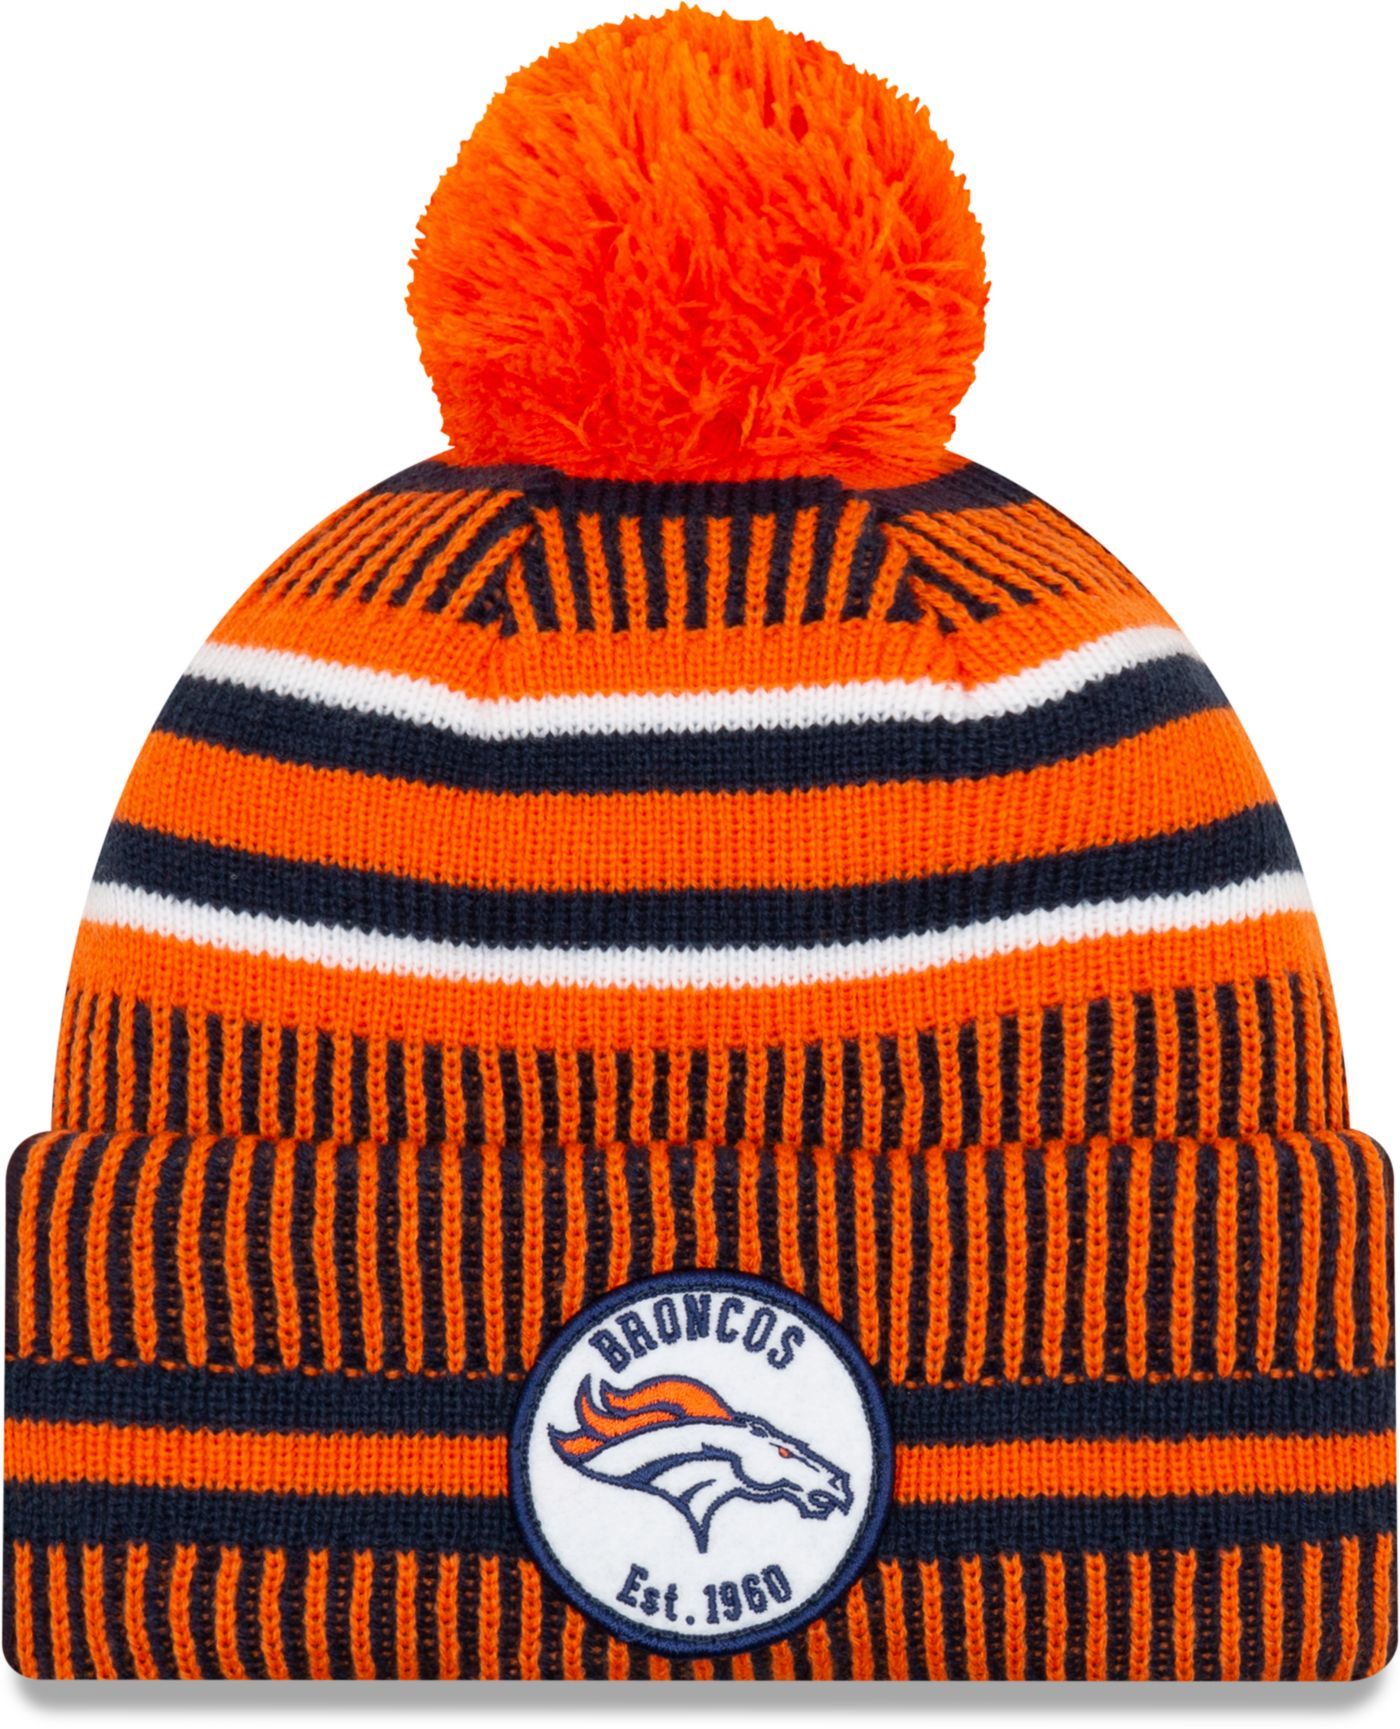 New Era Men's Denver Broncos Sideline Home Sport Pom Knit